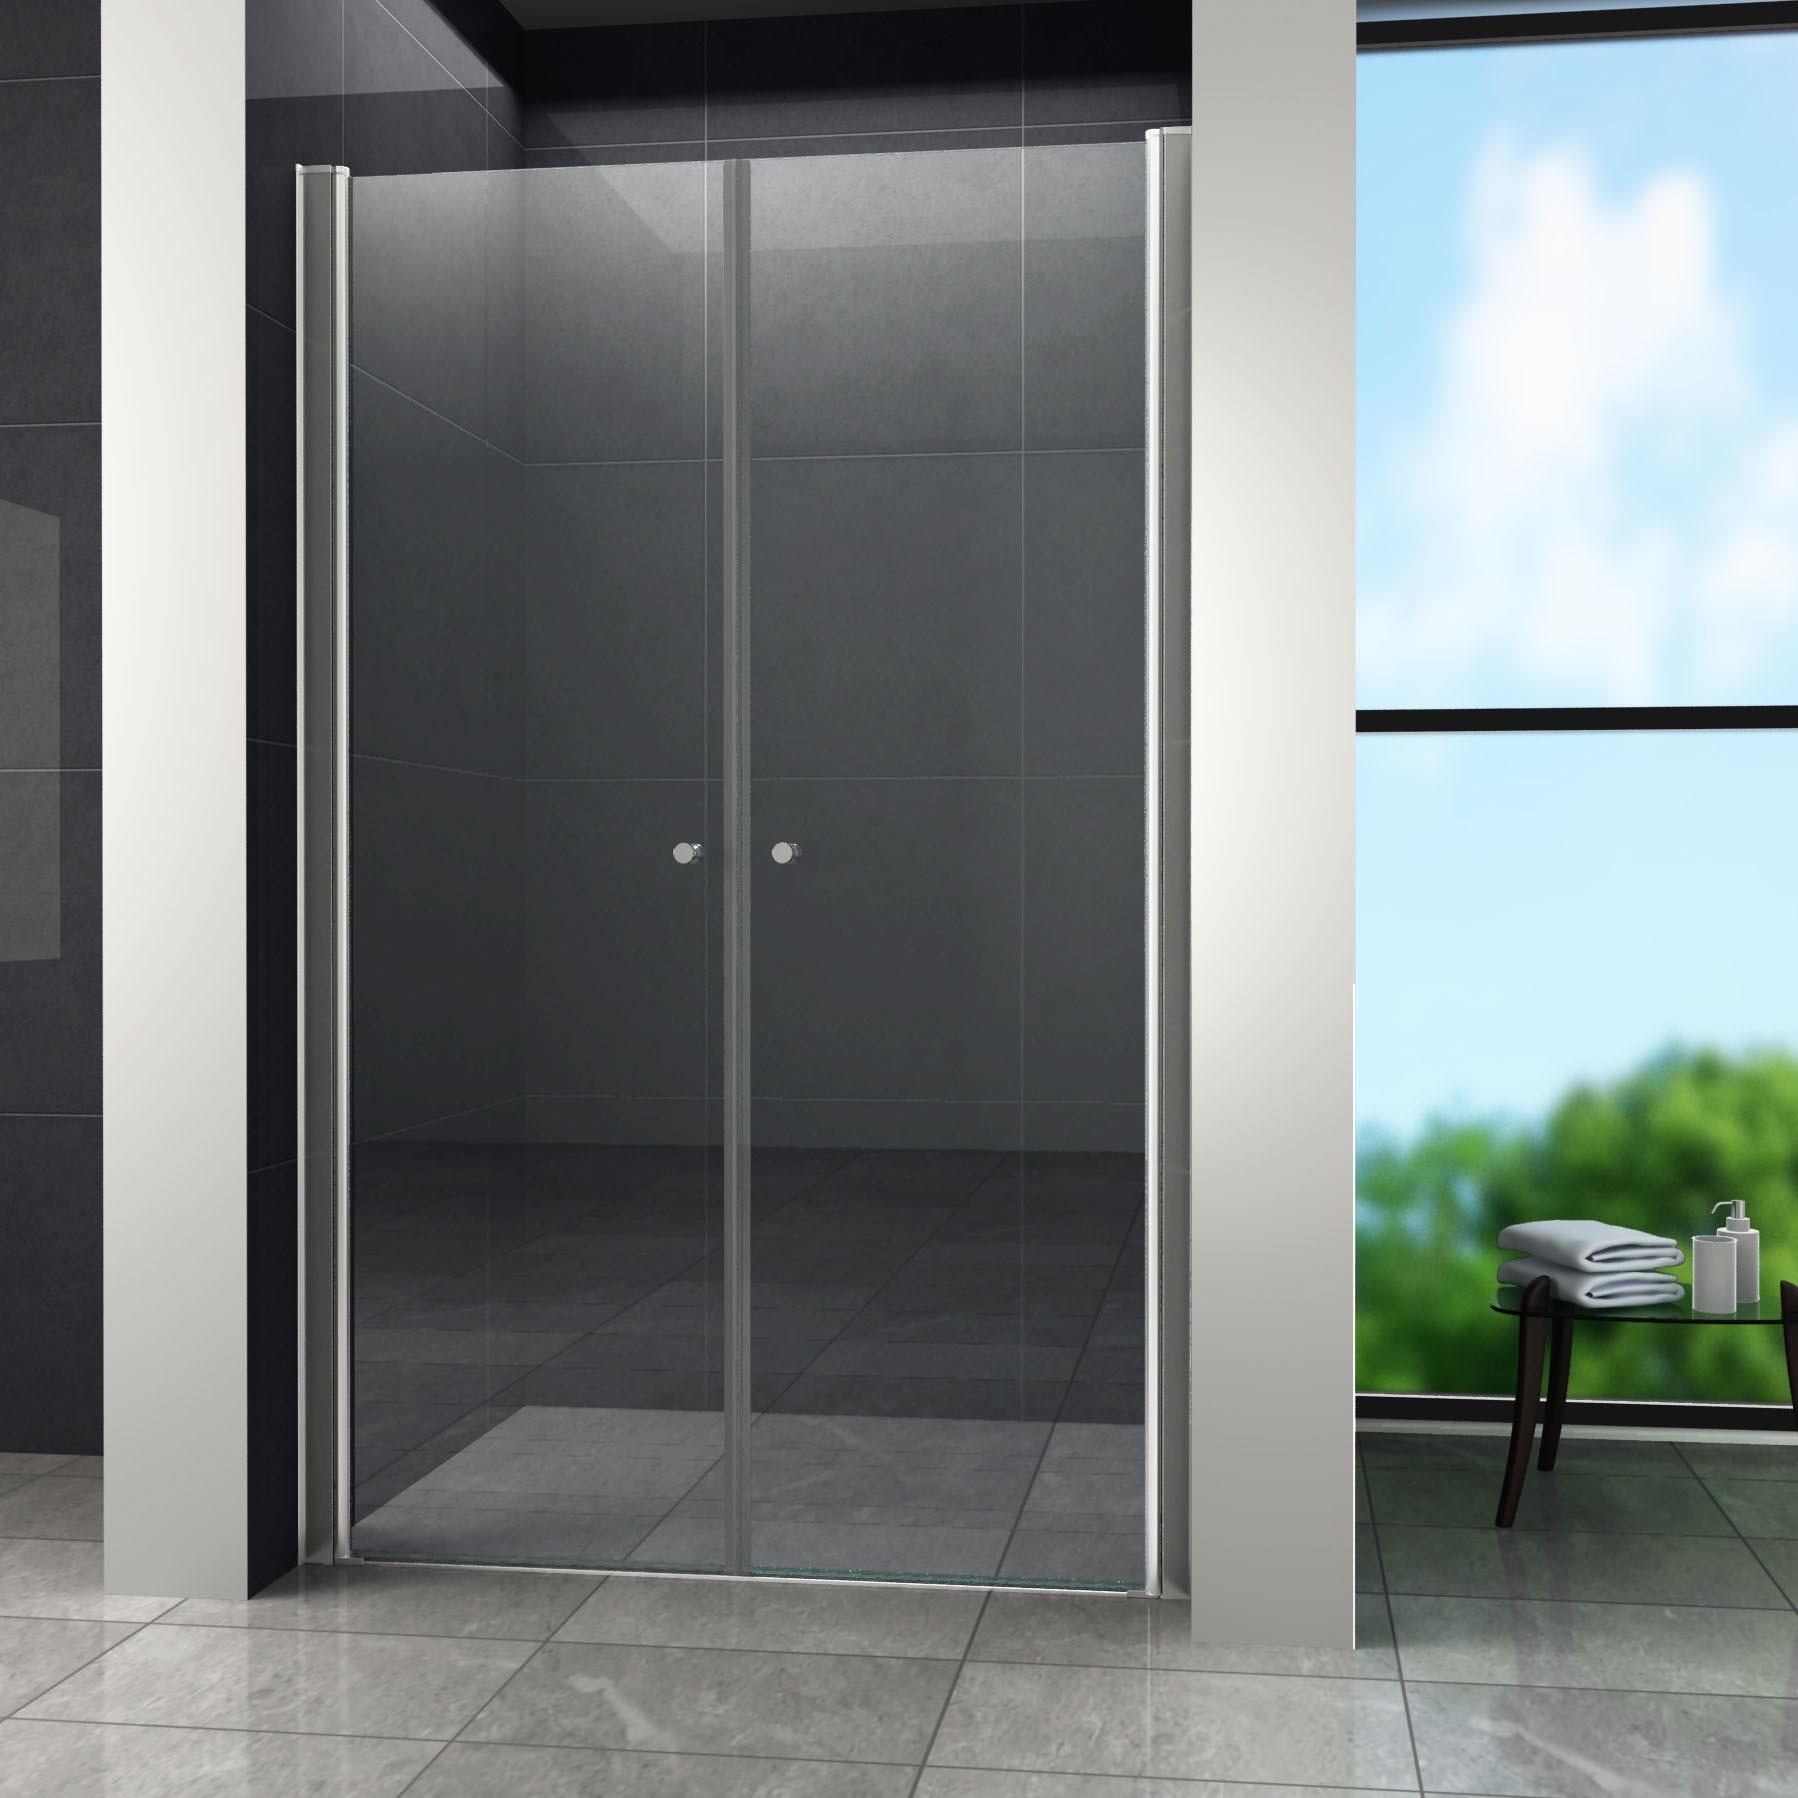 Swing Douchedeur Pendeldeur 80x180 cm Helder Glas binnen 2 tot 4 werkdagen in huis met voordeel